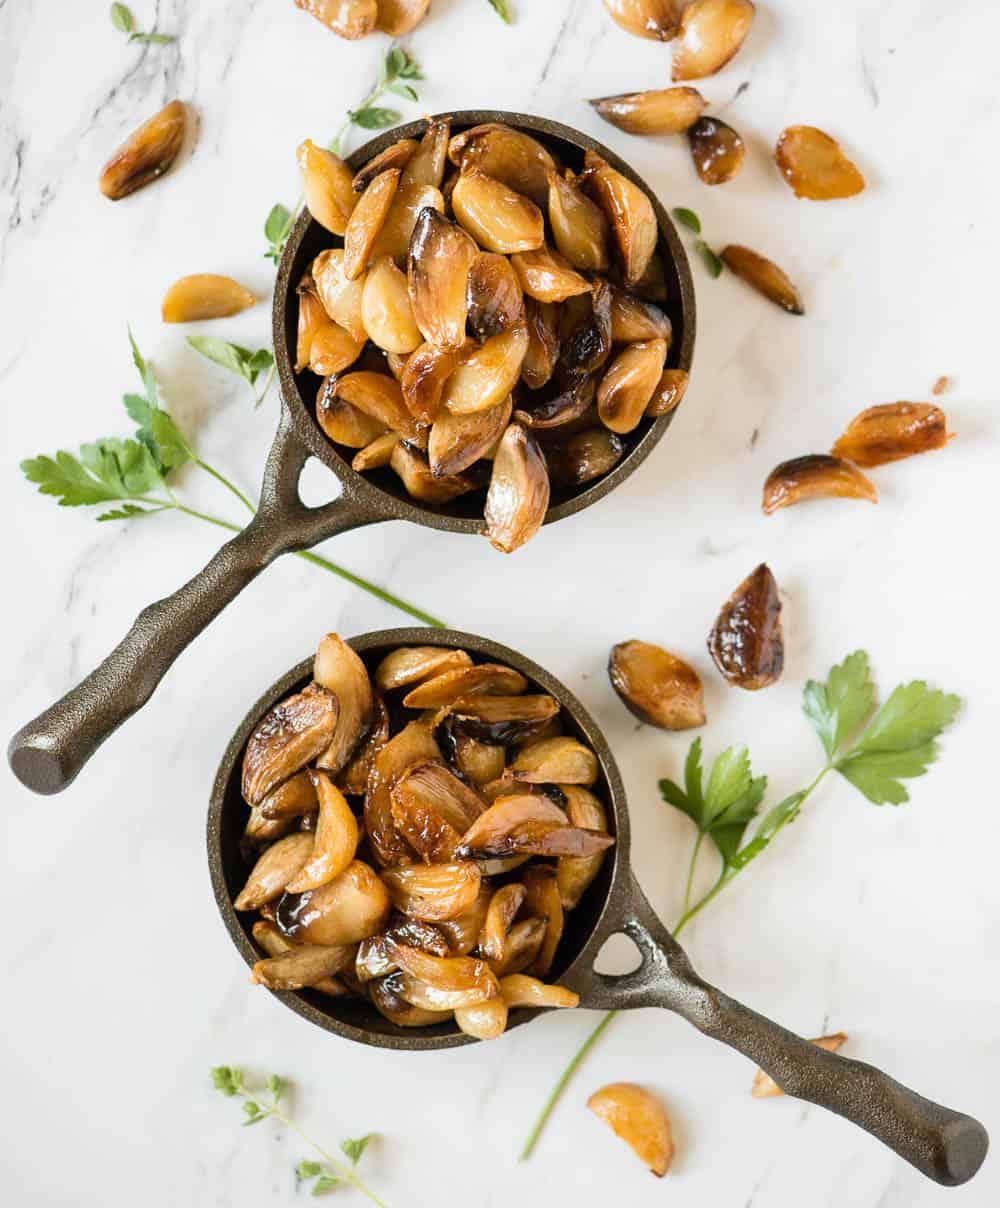 easiest way to make roasted garlic